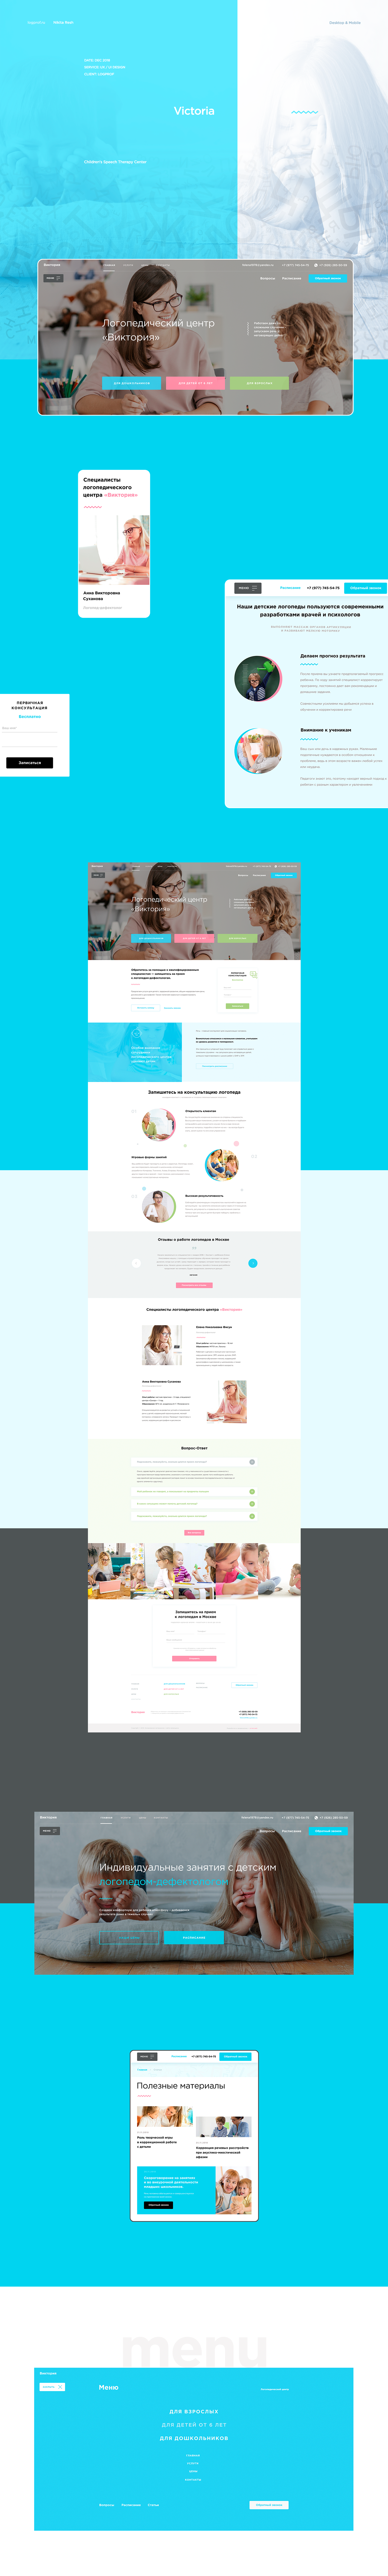 Interface clean blue psychology children social training speech Education mobile